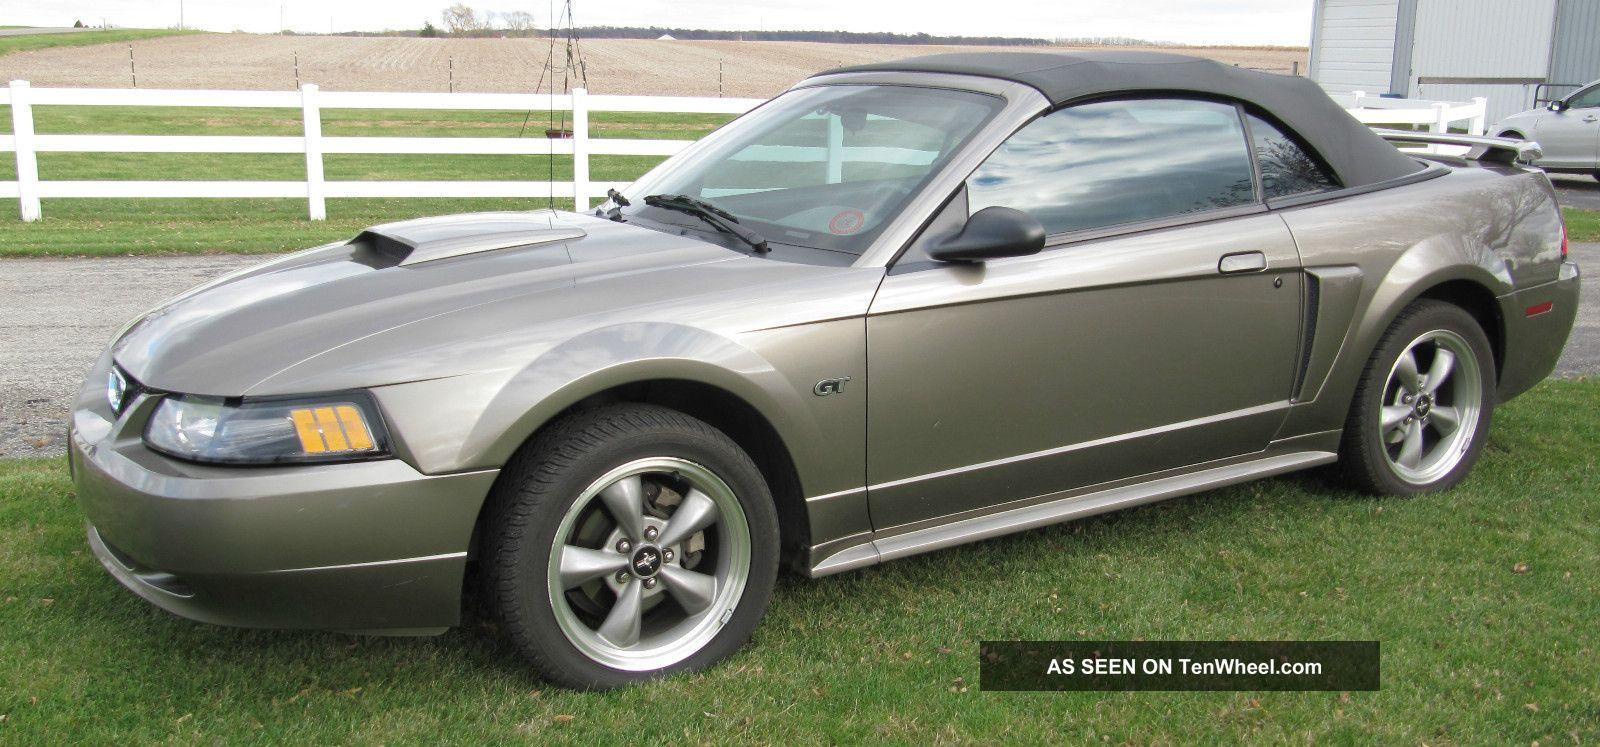 2001 ford mustang gt convertible 2 door 4 6l. Black Bedroom Furniture Sets. Home Design Ideas